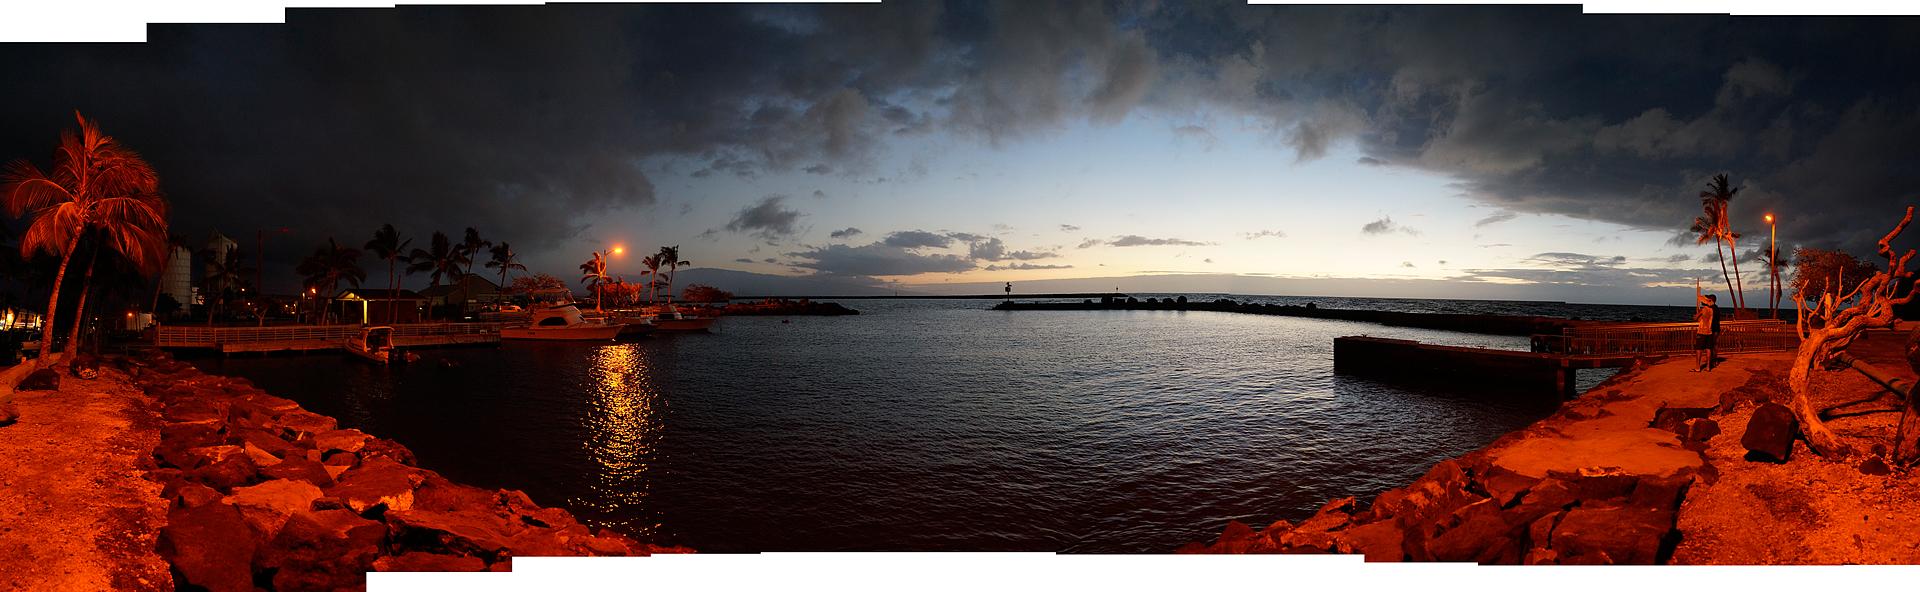 Kawaihae Harbor